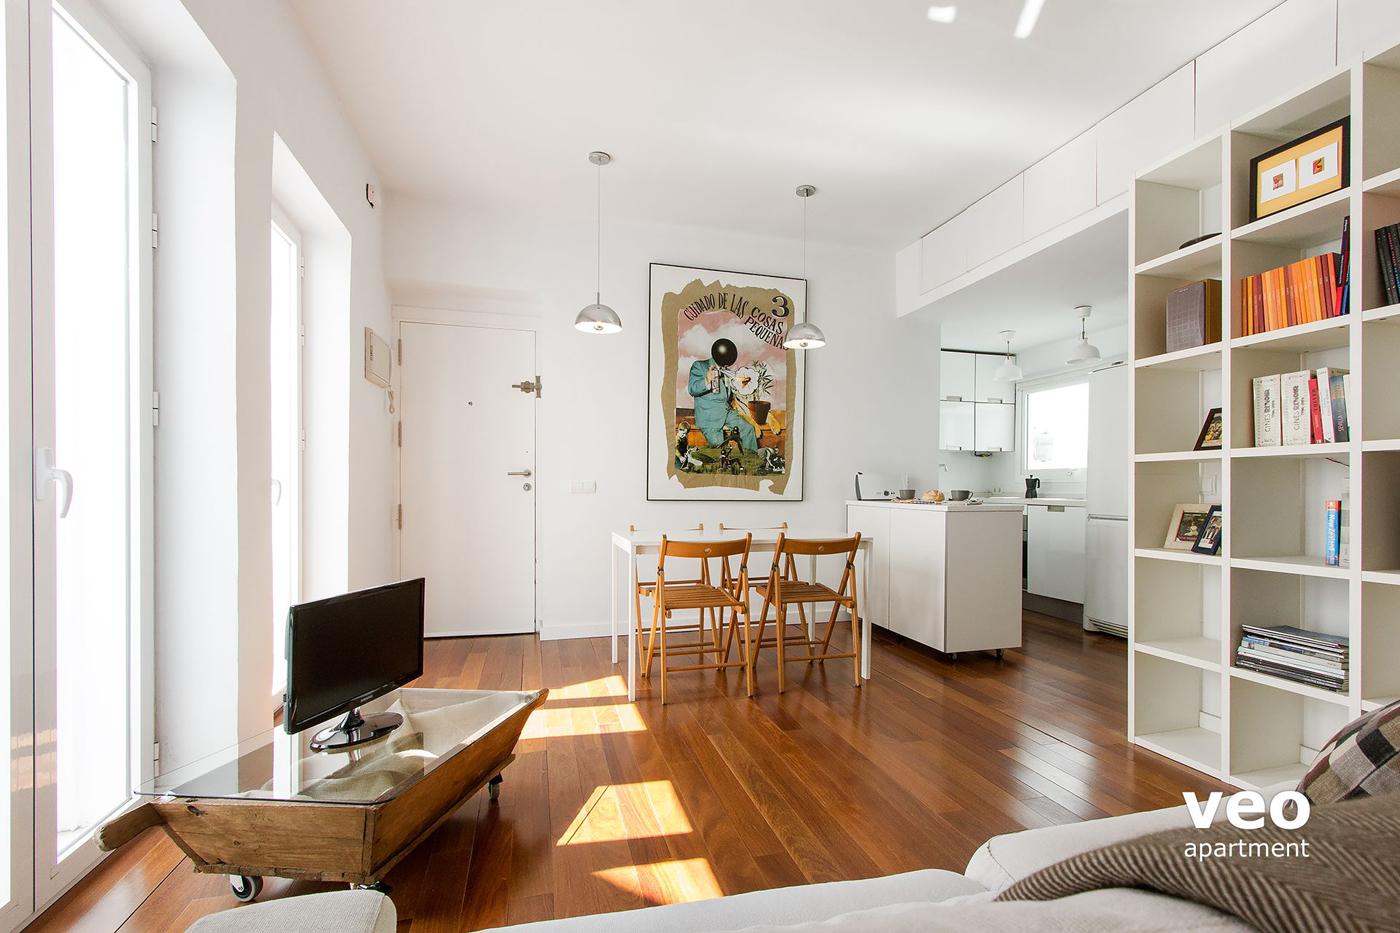 Reforma de apartamento 40 m2 01